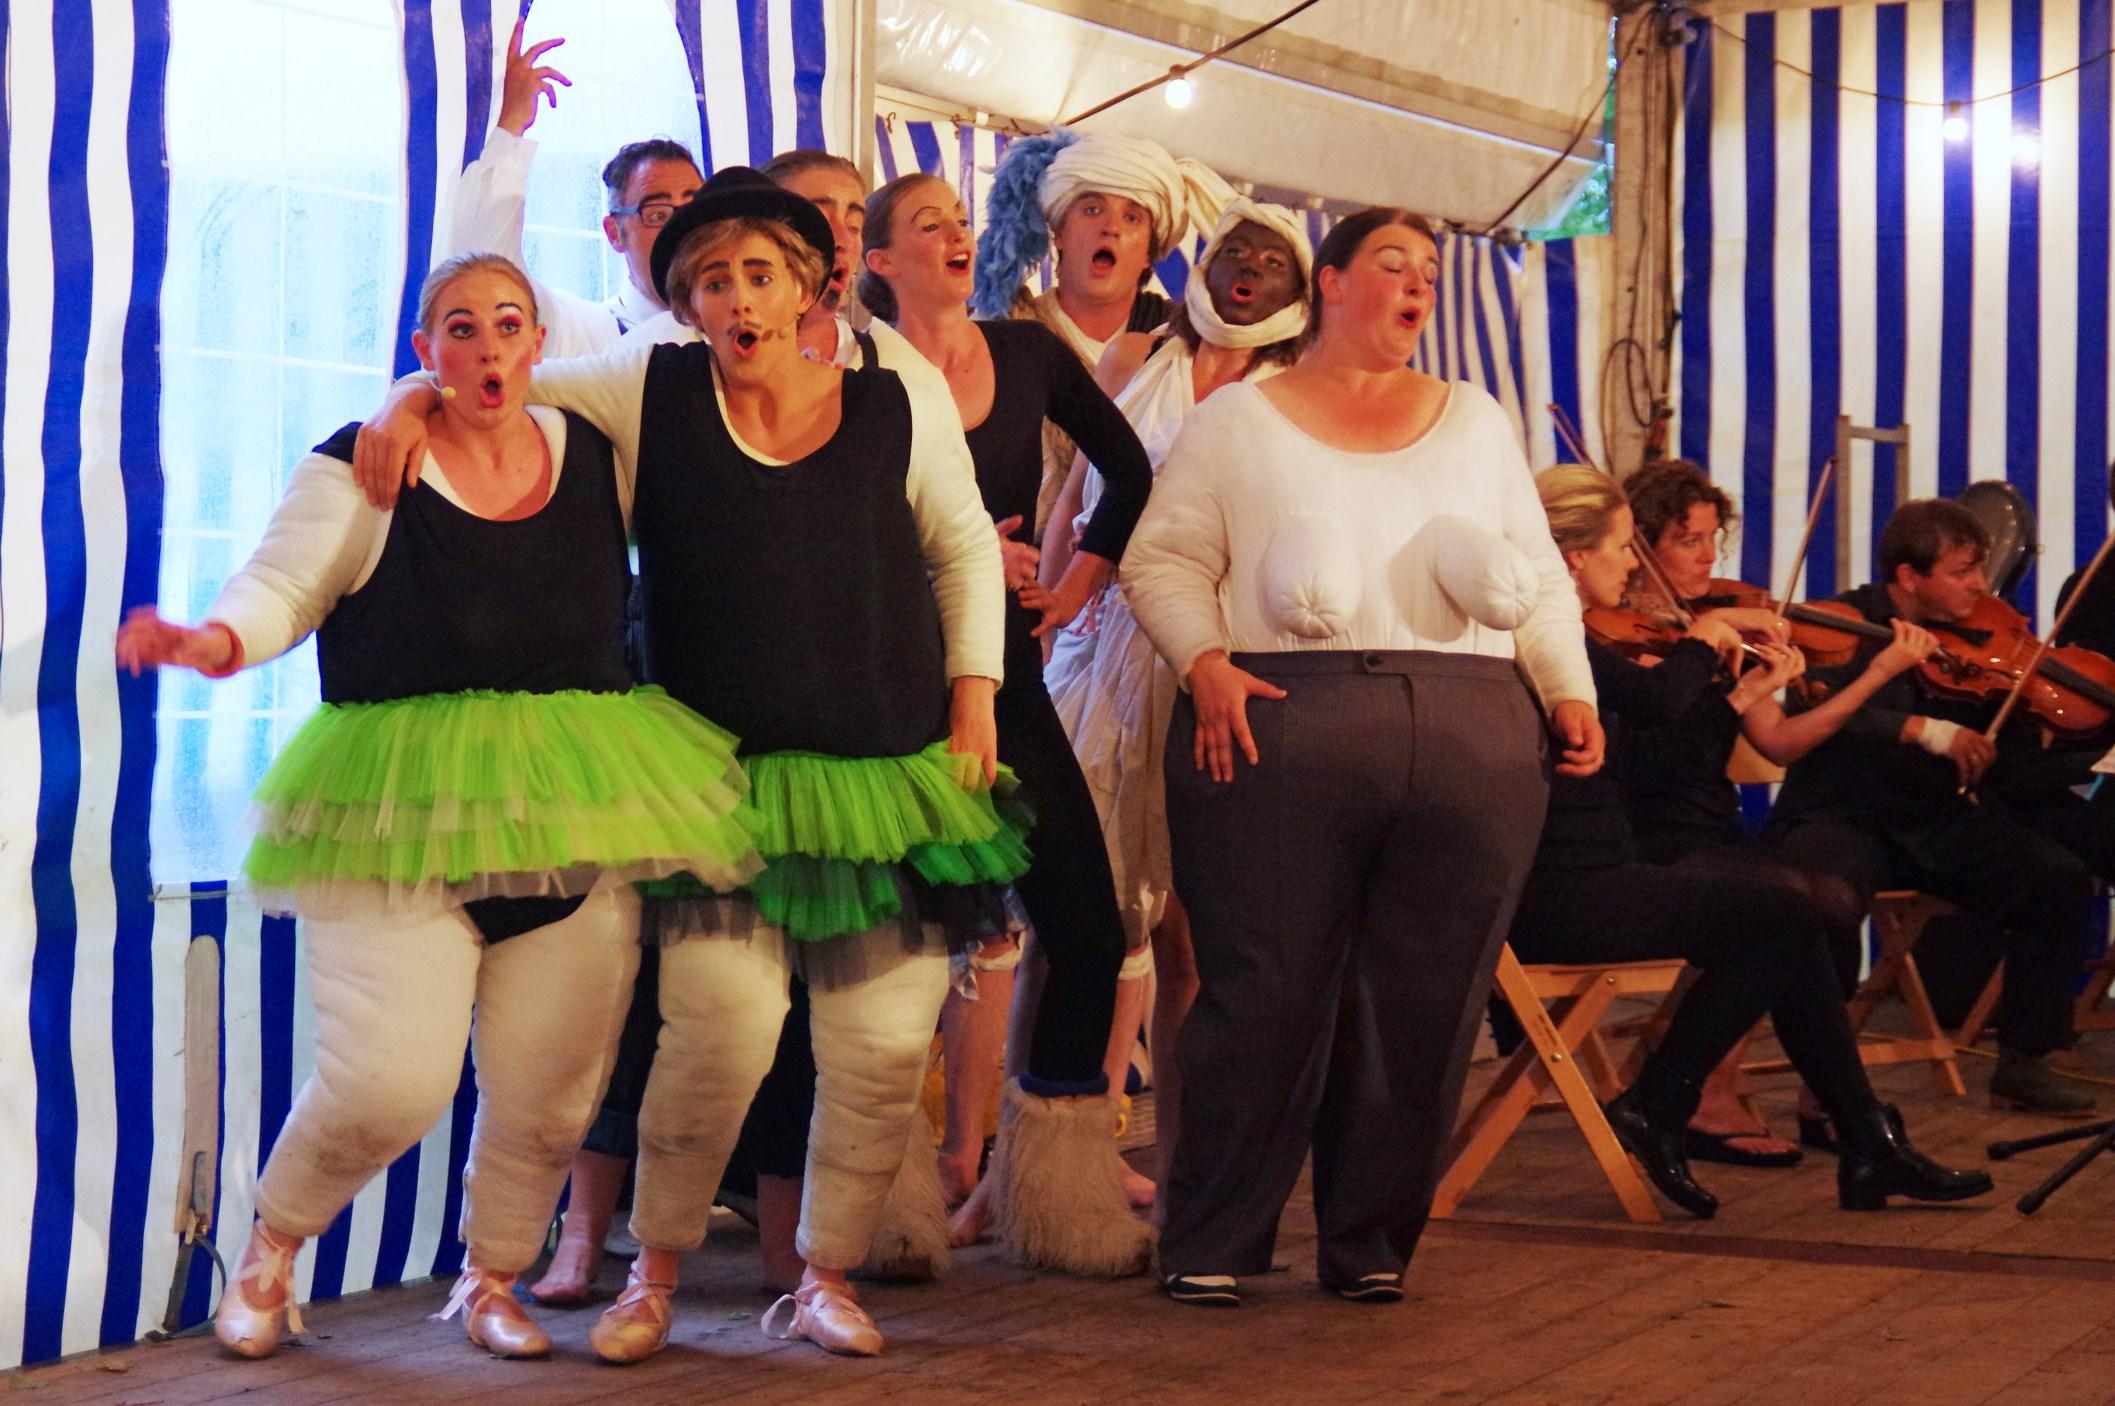 Opera Nijetrijne in de tent 2014